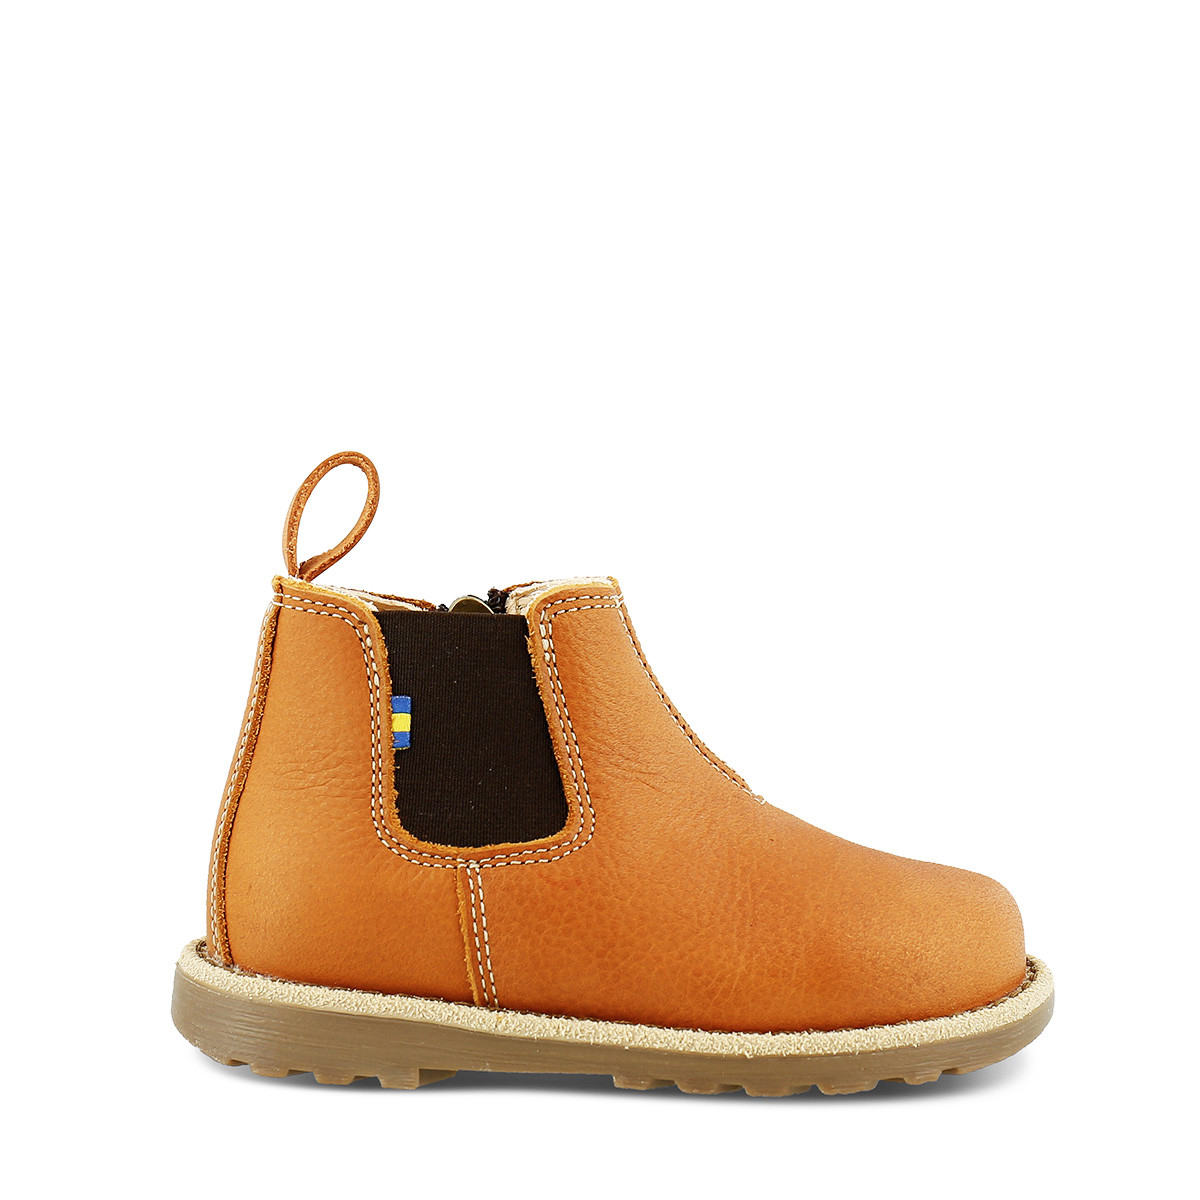 Nymölla EP ekologisk sko från Kavat lightbrown